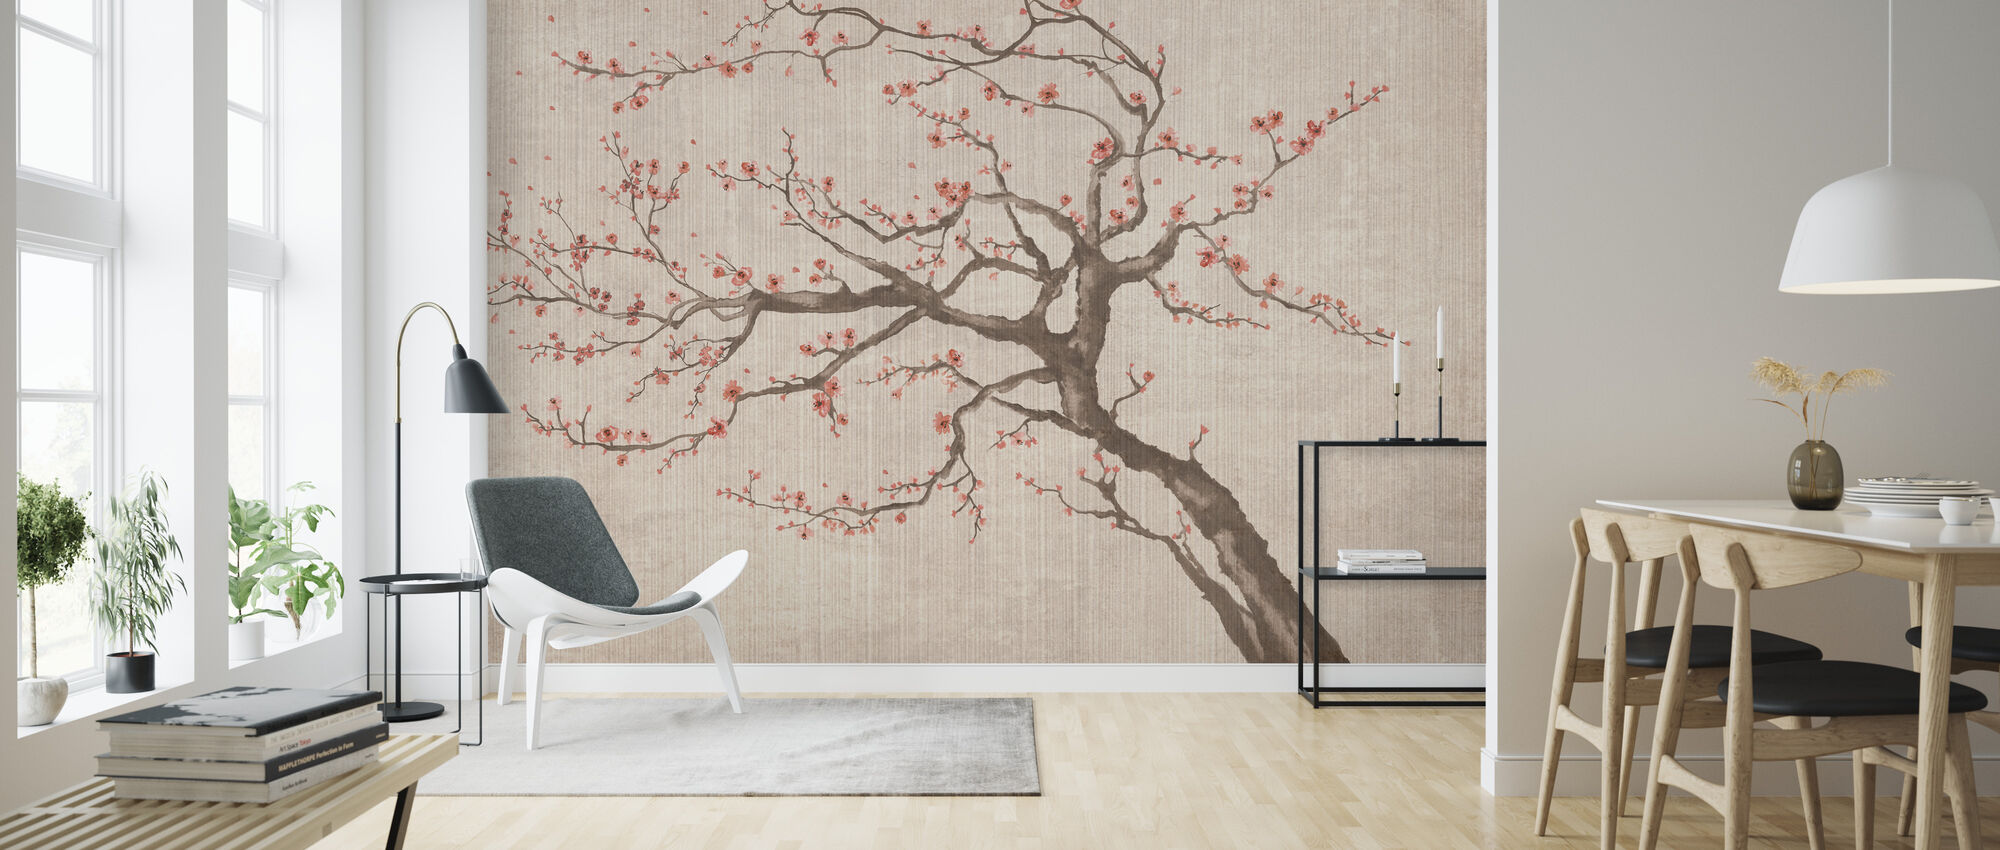 Sakura Våren VII - Tapet - Stue